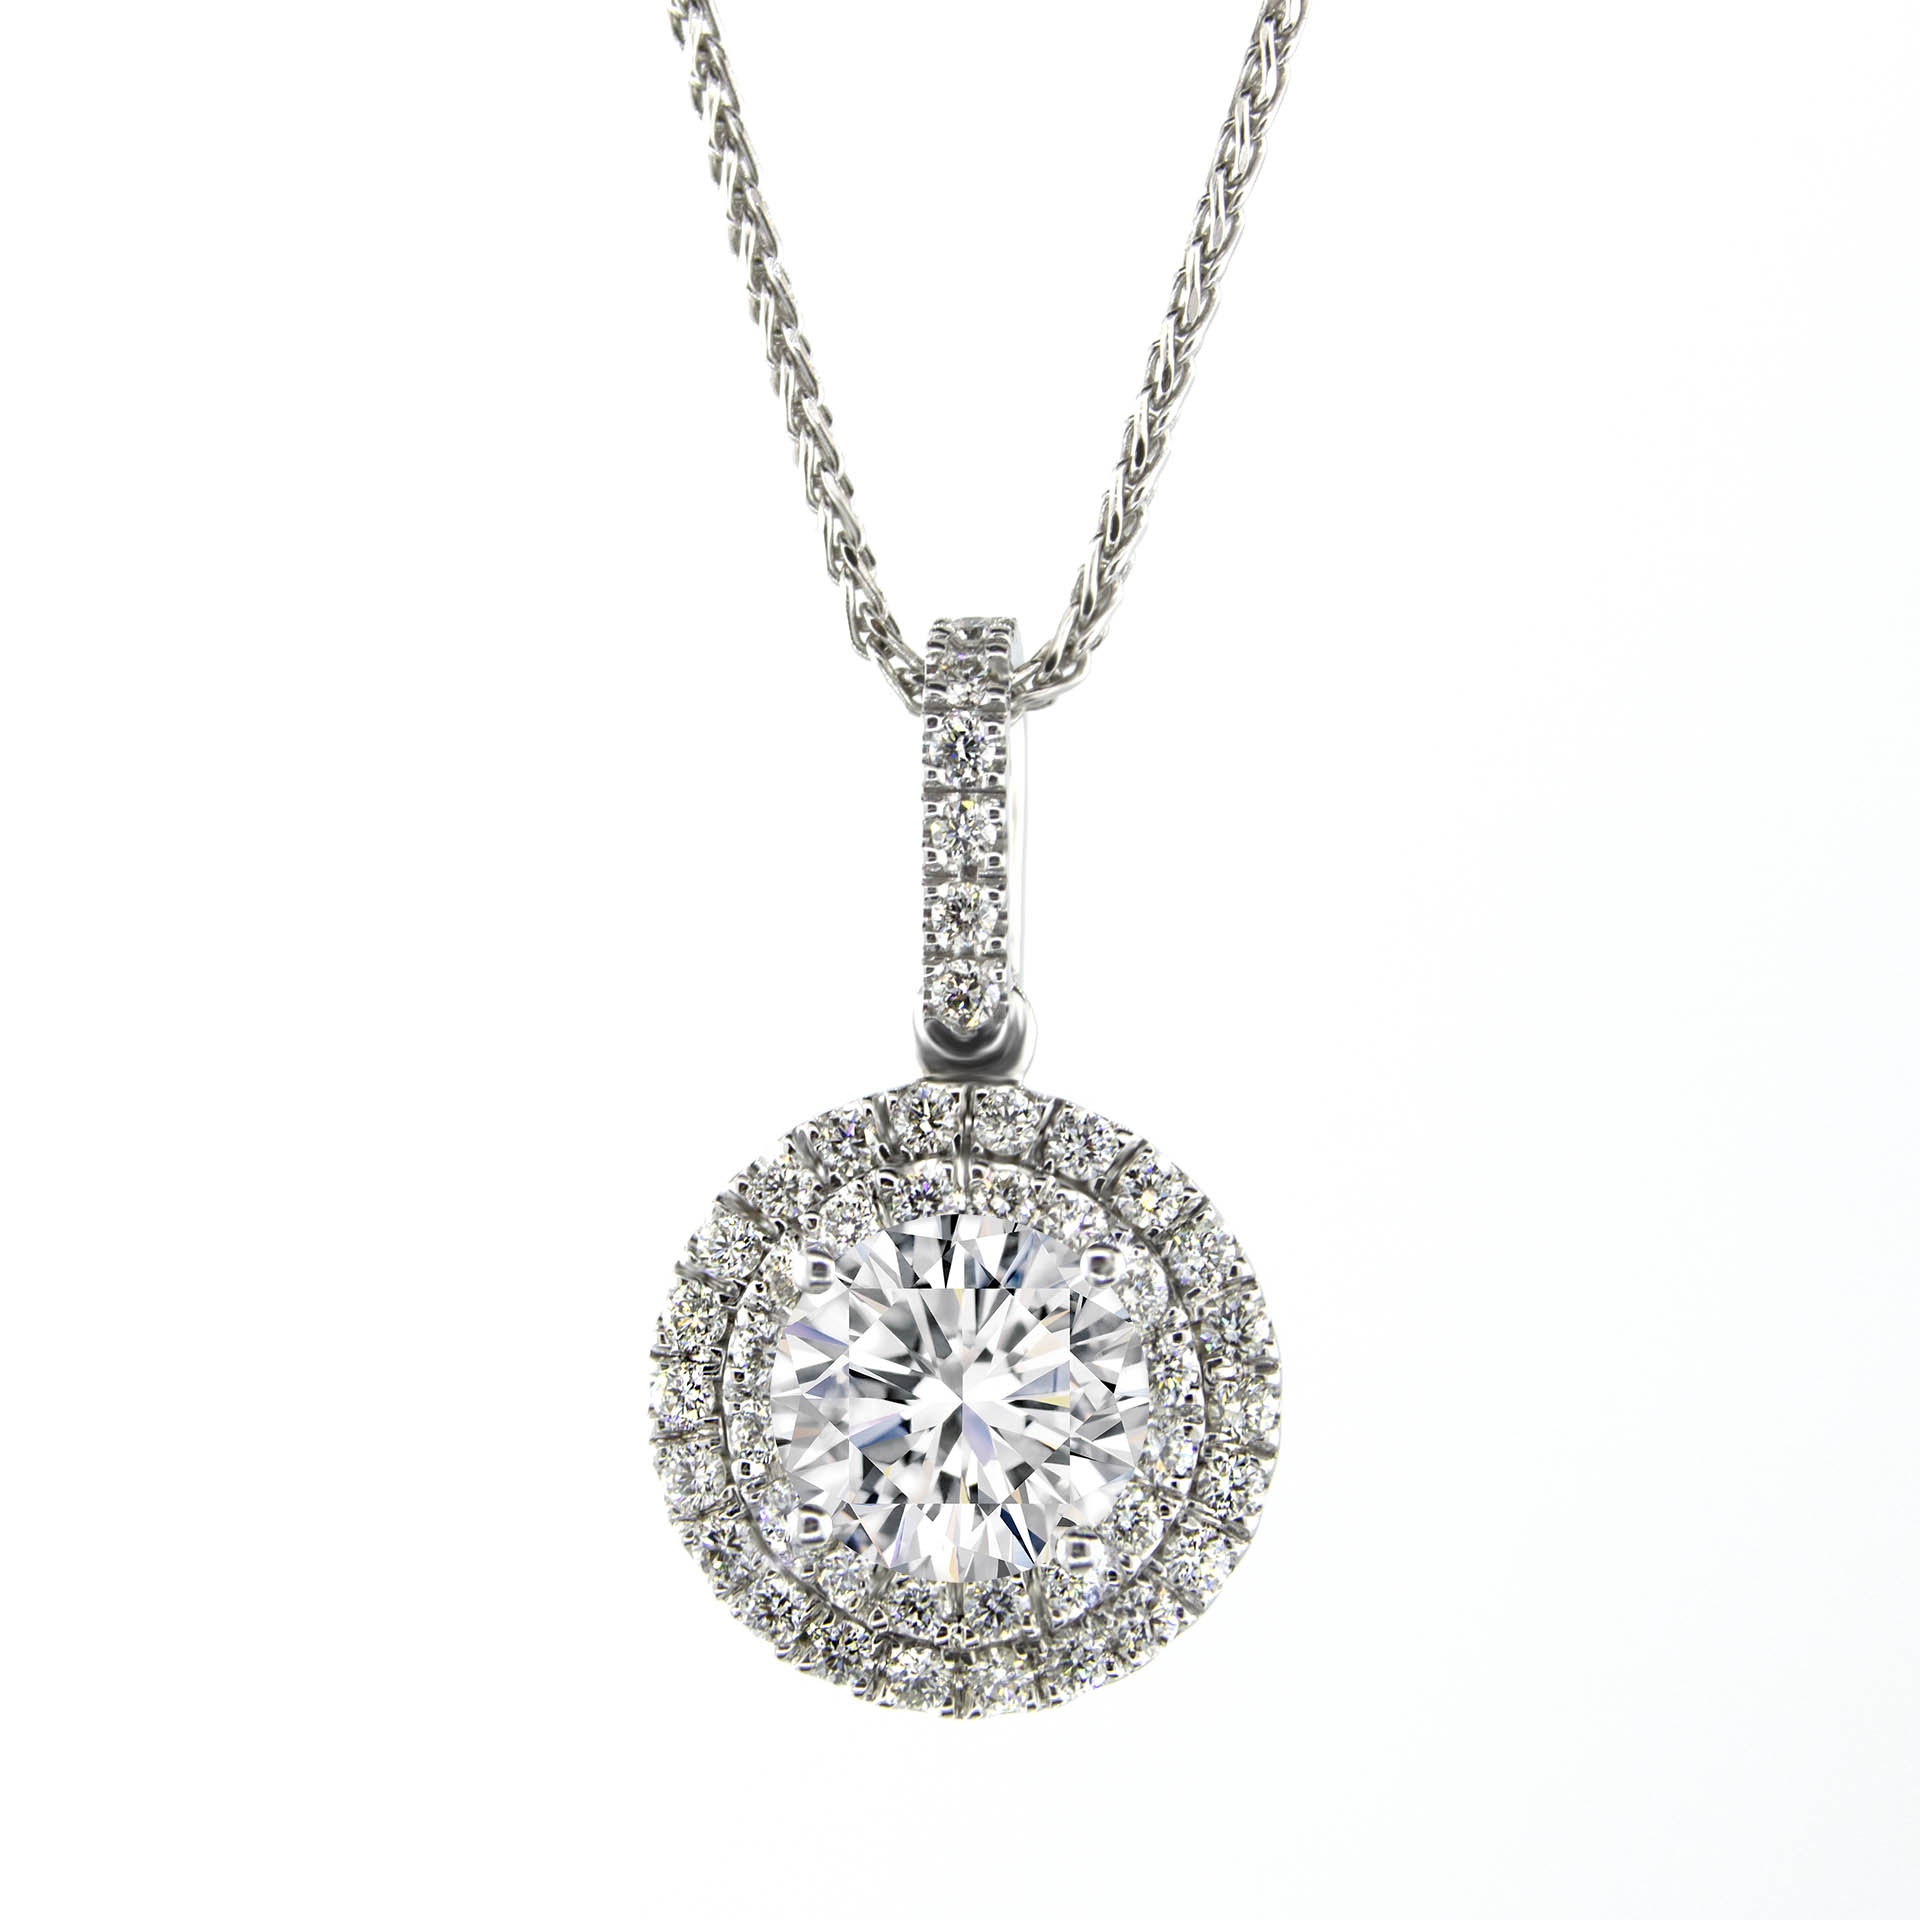 44 diamonds halo pendant sarkisians jewelry halo pendant with center diamonds pn691 1 aloadofball Choice Image